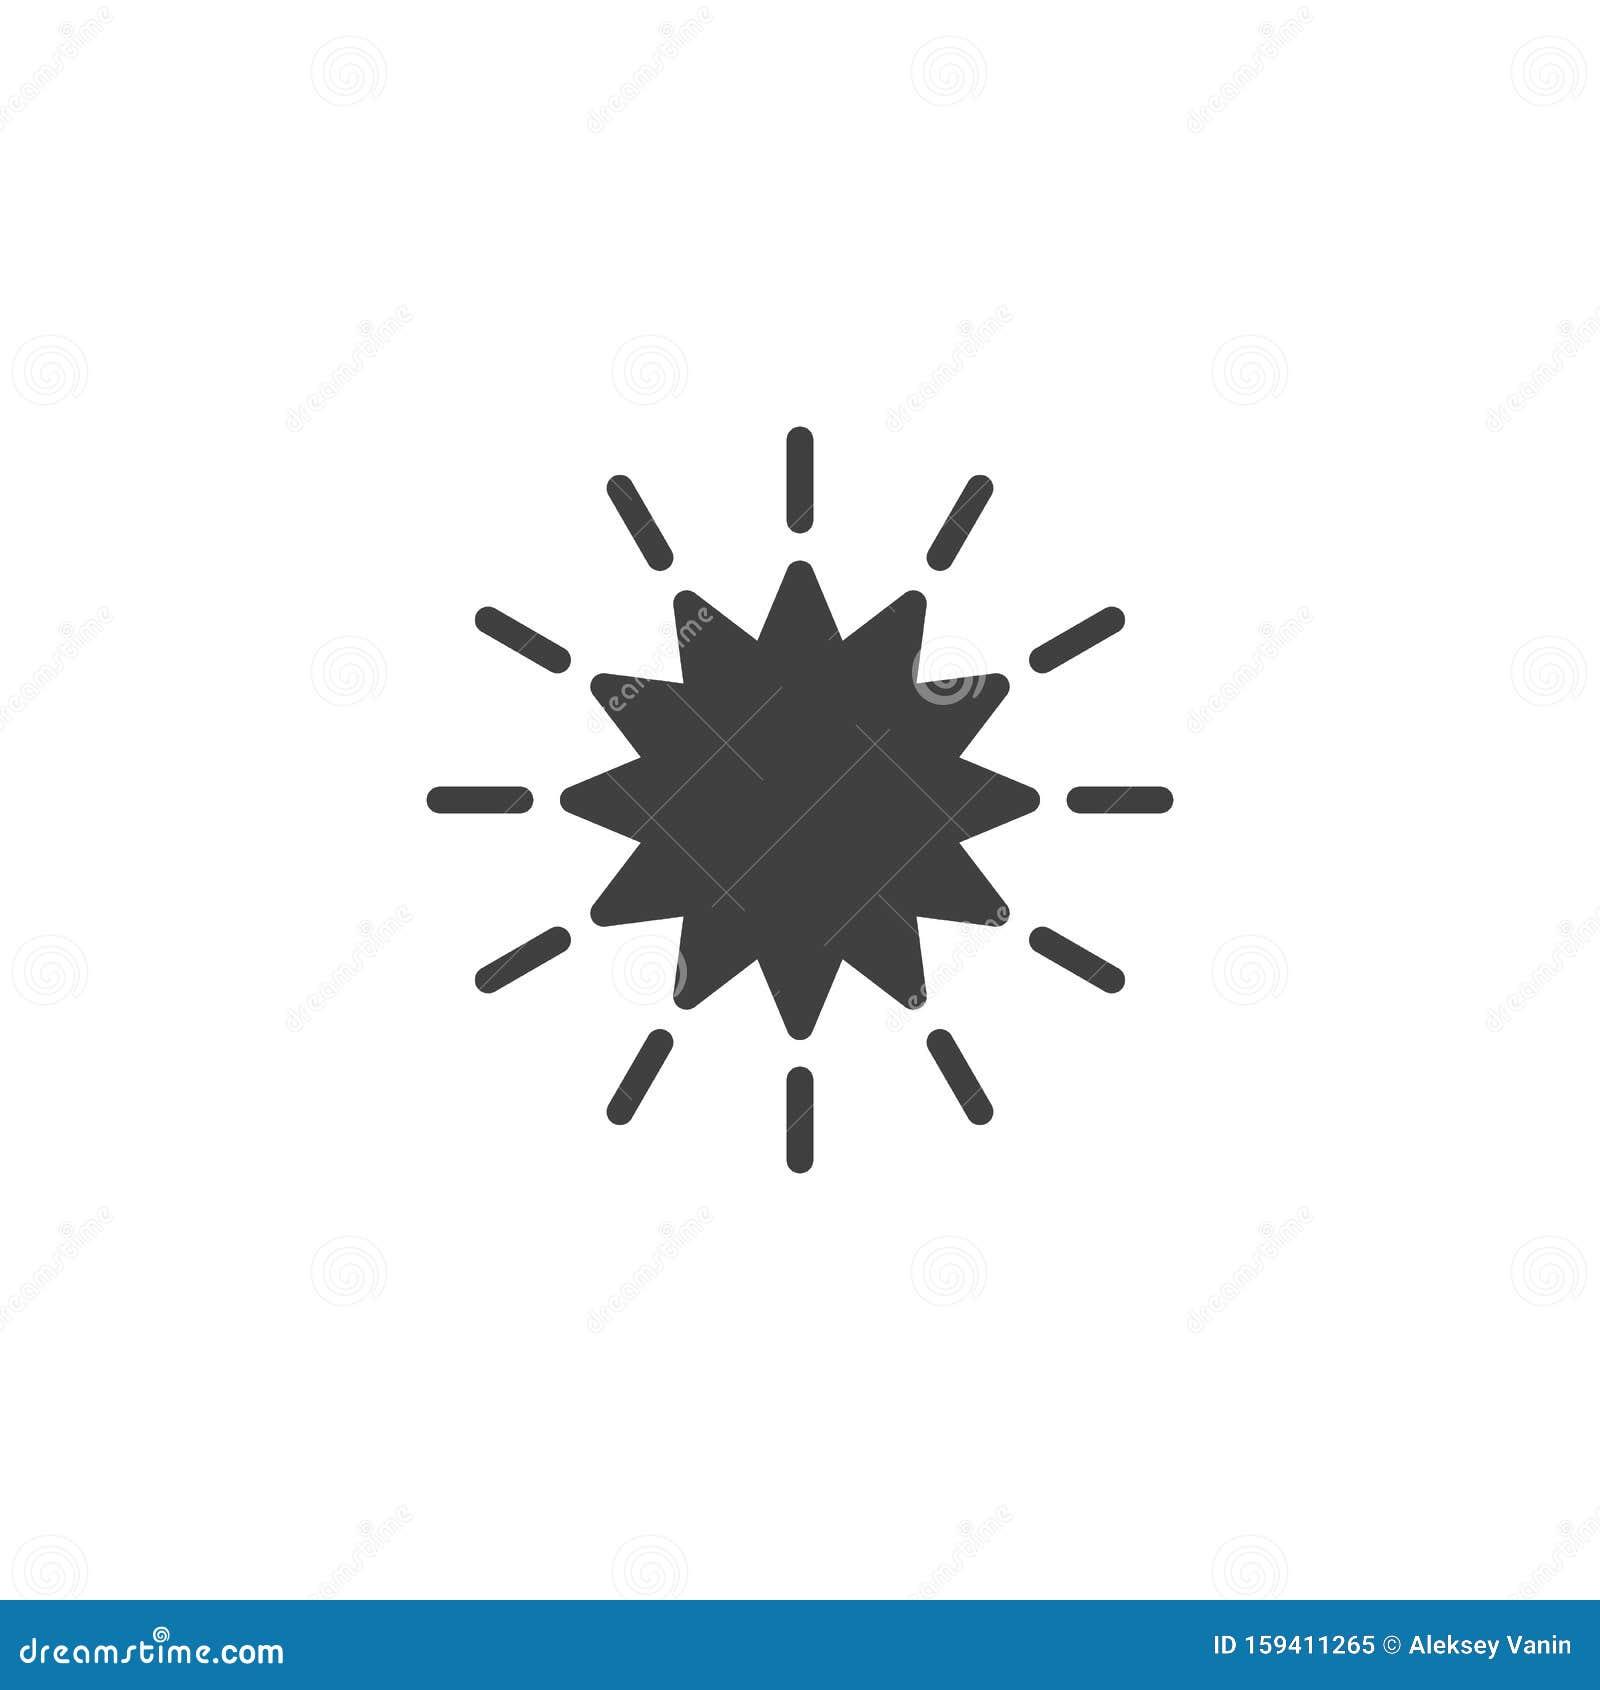 Starburst Vector Icon Stock Vector Illustration Of Explosion 159411265 Download starburst vector stock vectors. dreamstime com